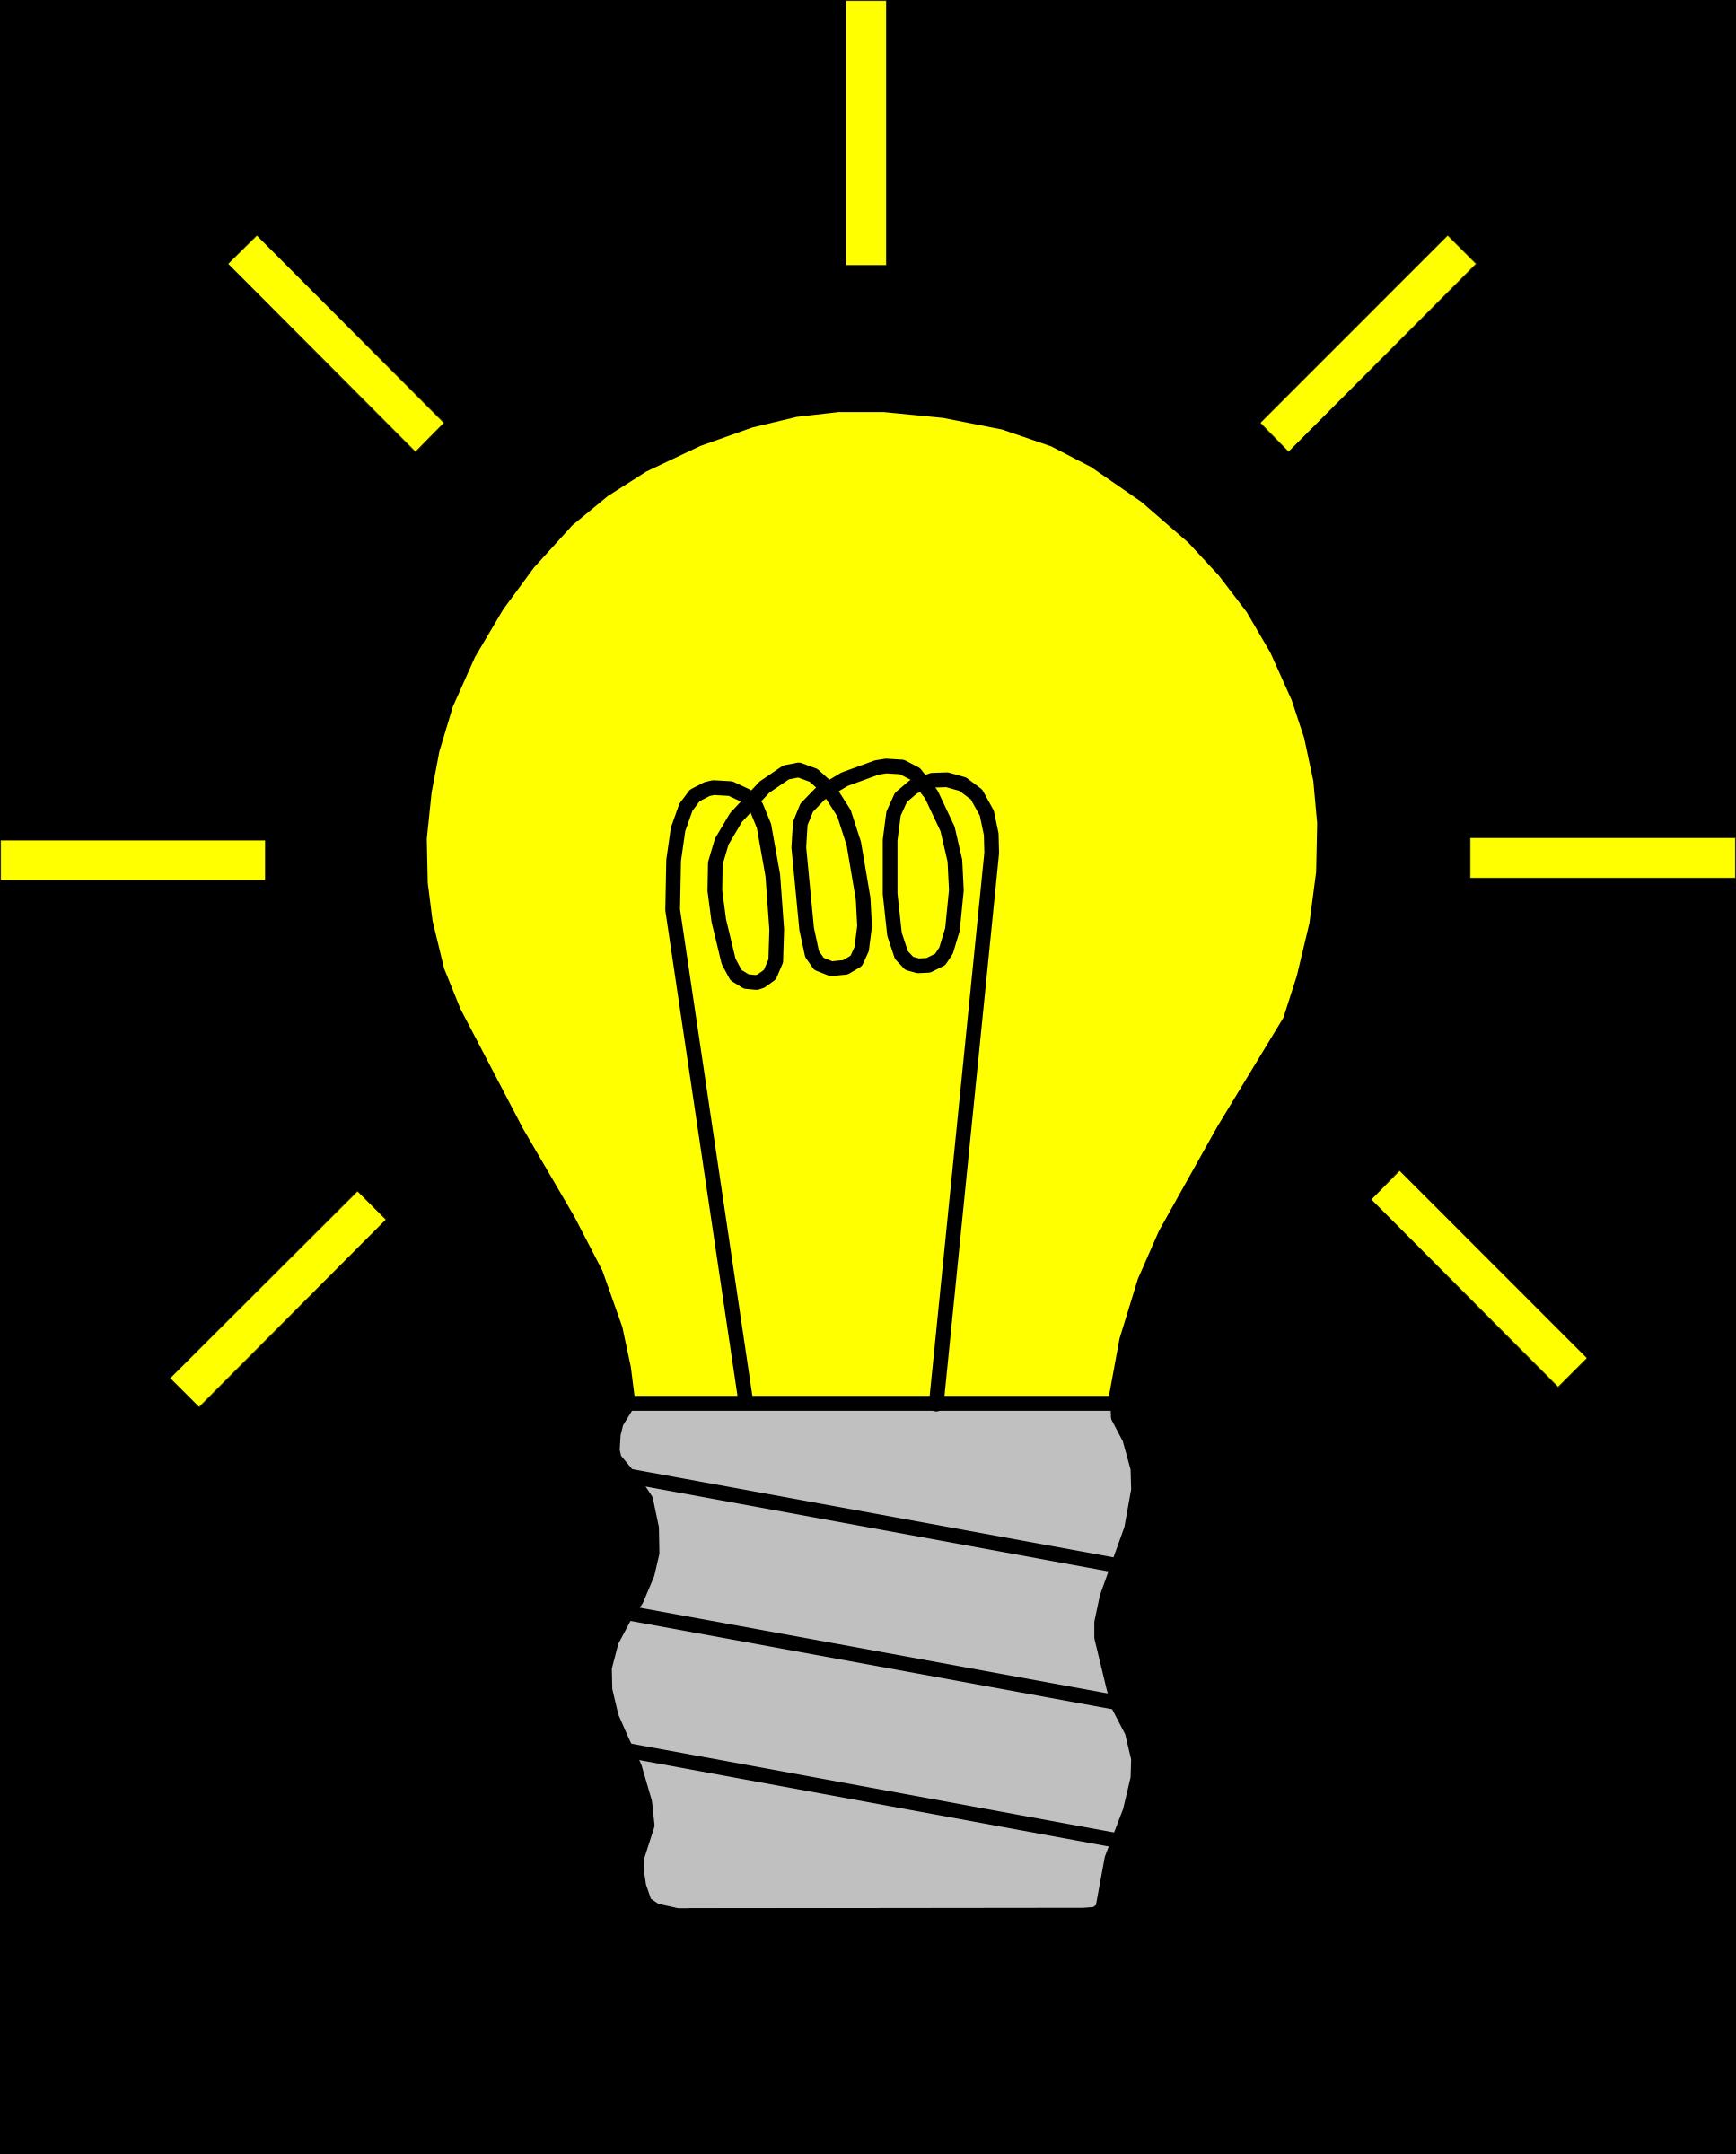 Clipart - Light Bulb On